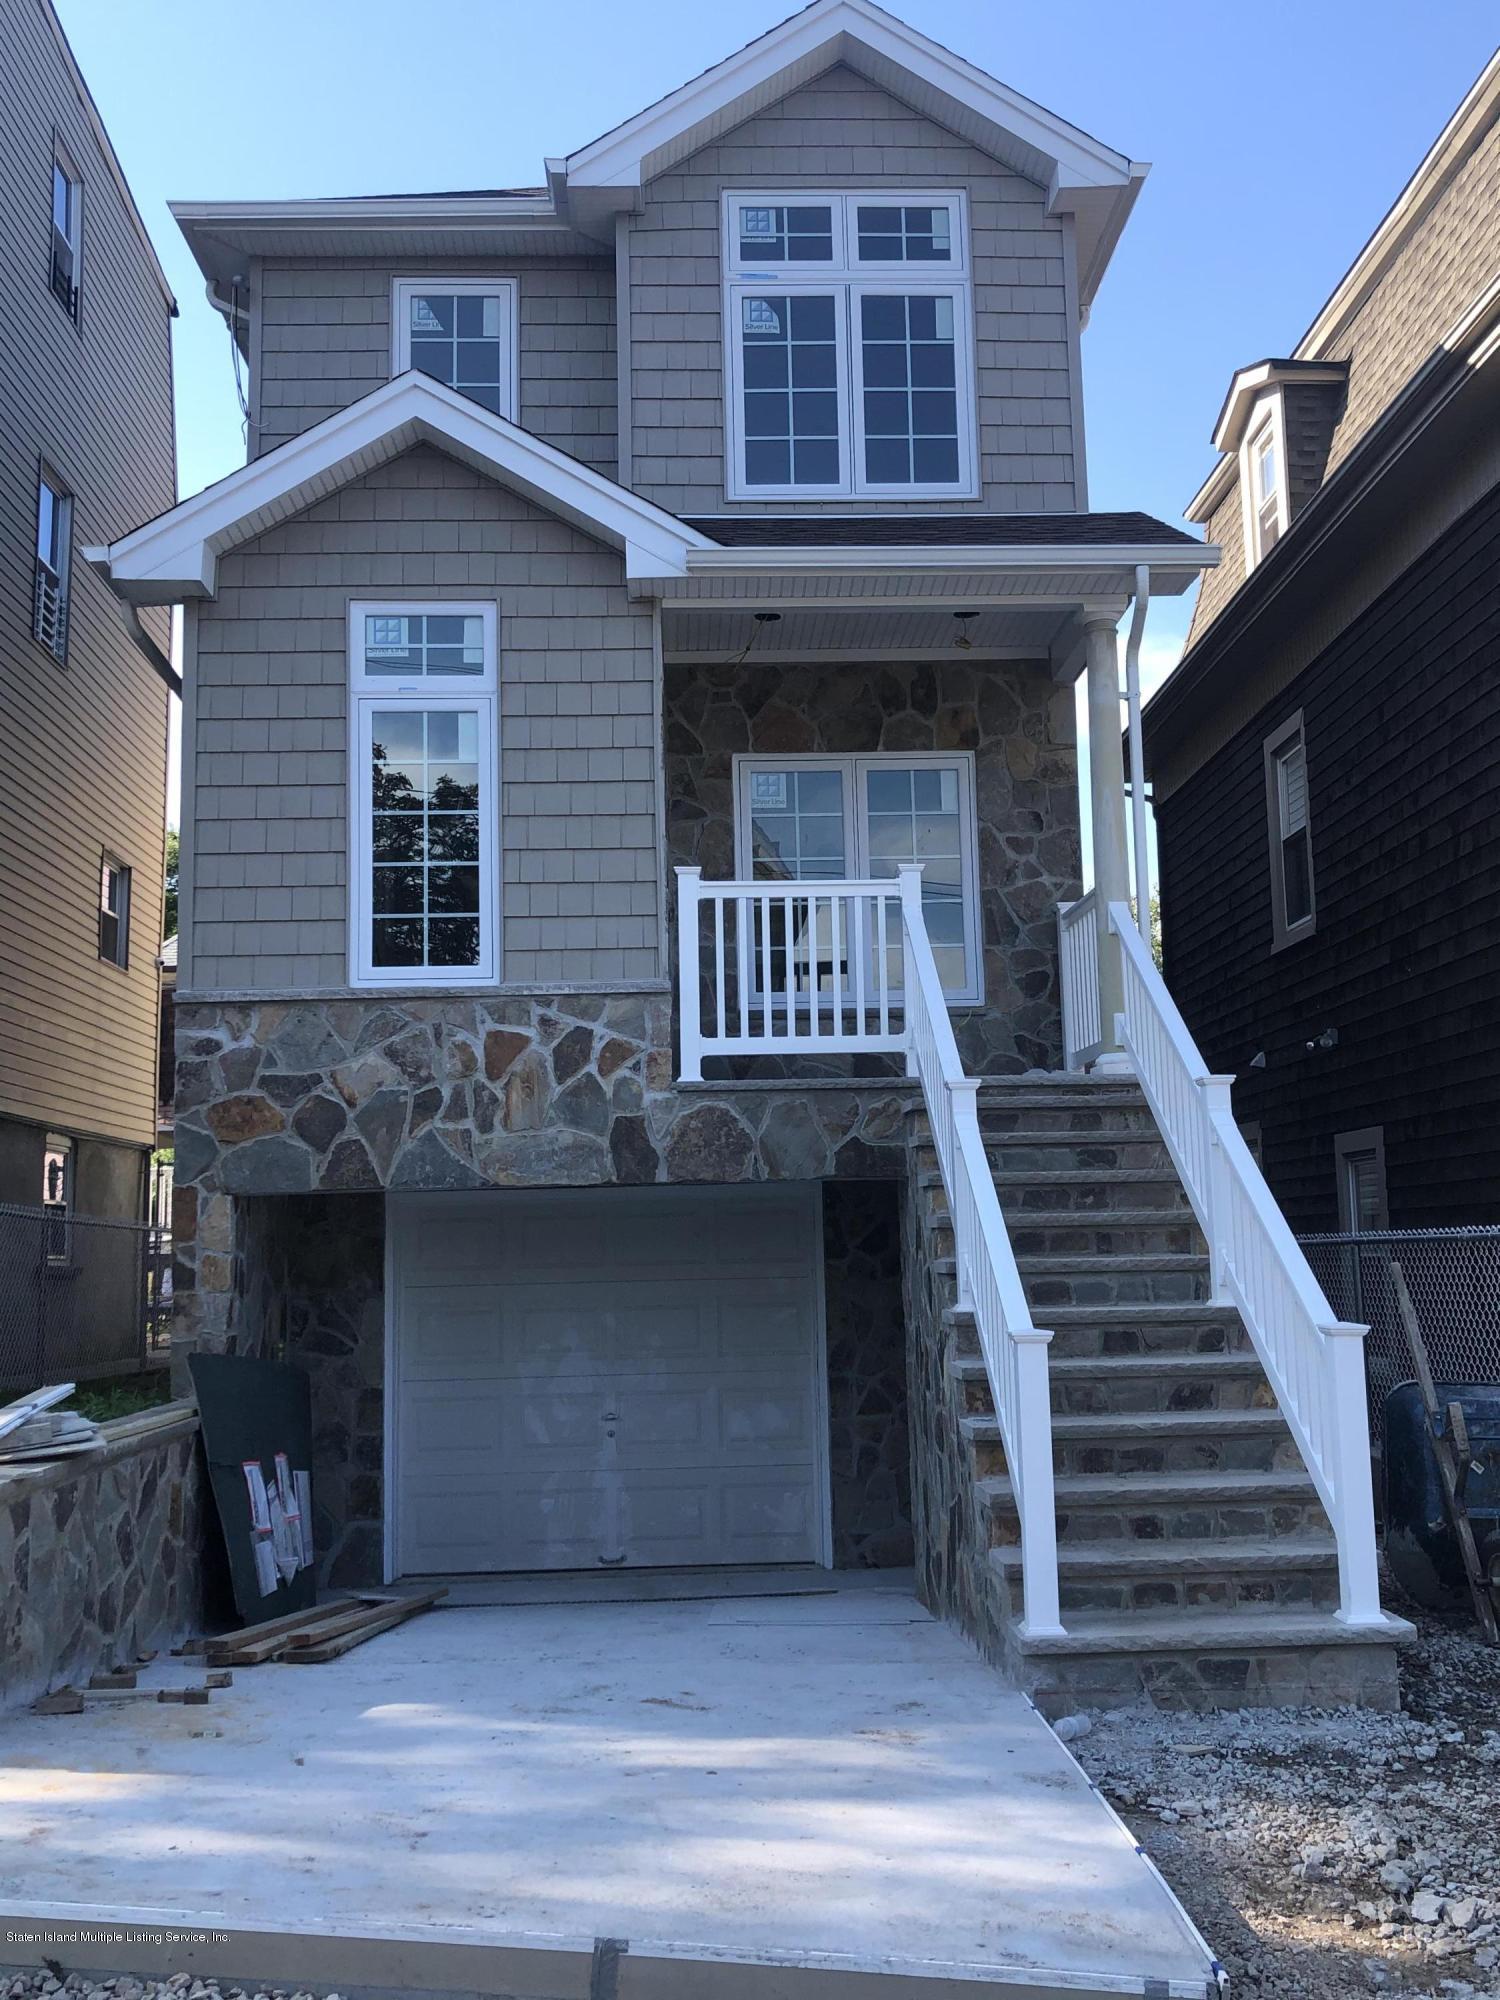 Single Family - Detached 32 Scribner Avenue  Staten Island, NY 10301, MLS-1128104-2